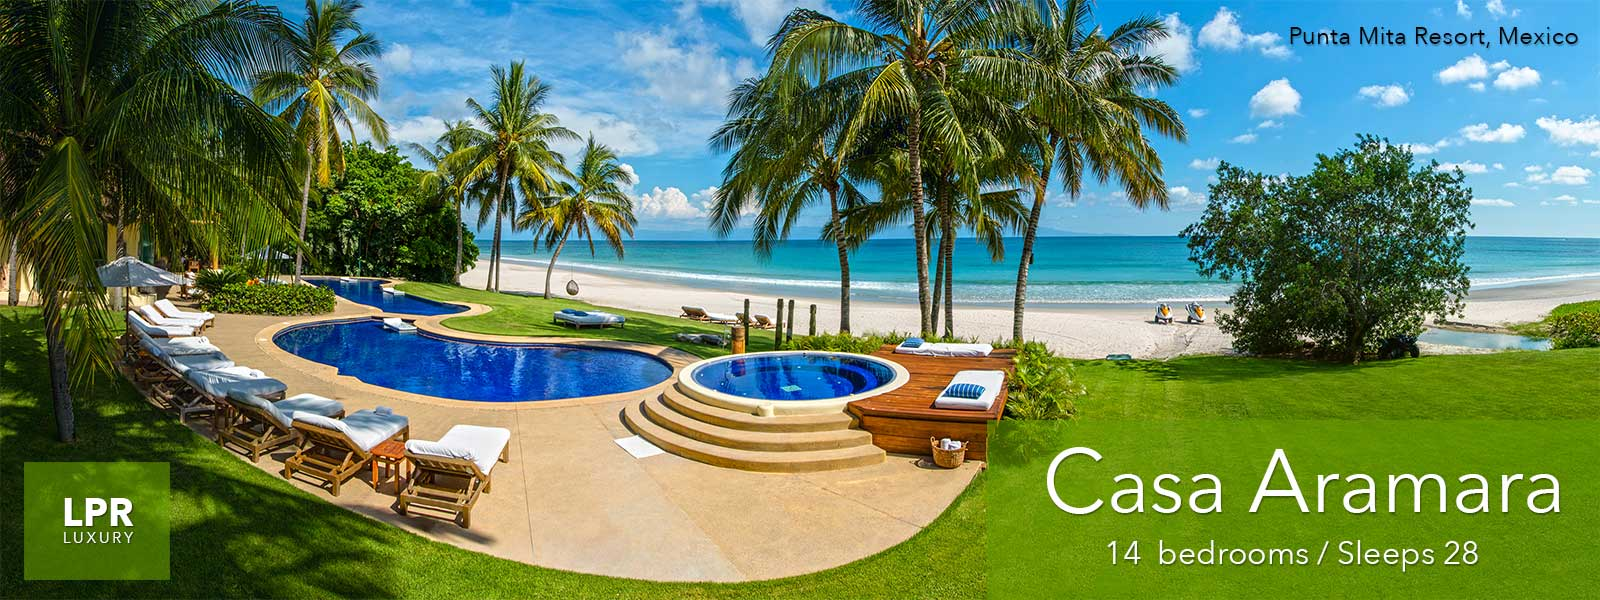 Casa Aramara Punta Mita Mexico - Ultra Luxury Vacation Villa at the Punta Mita Resort